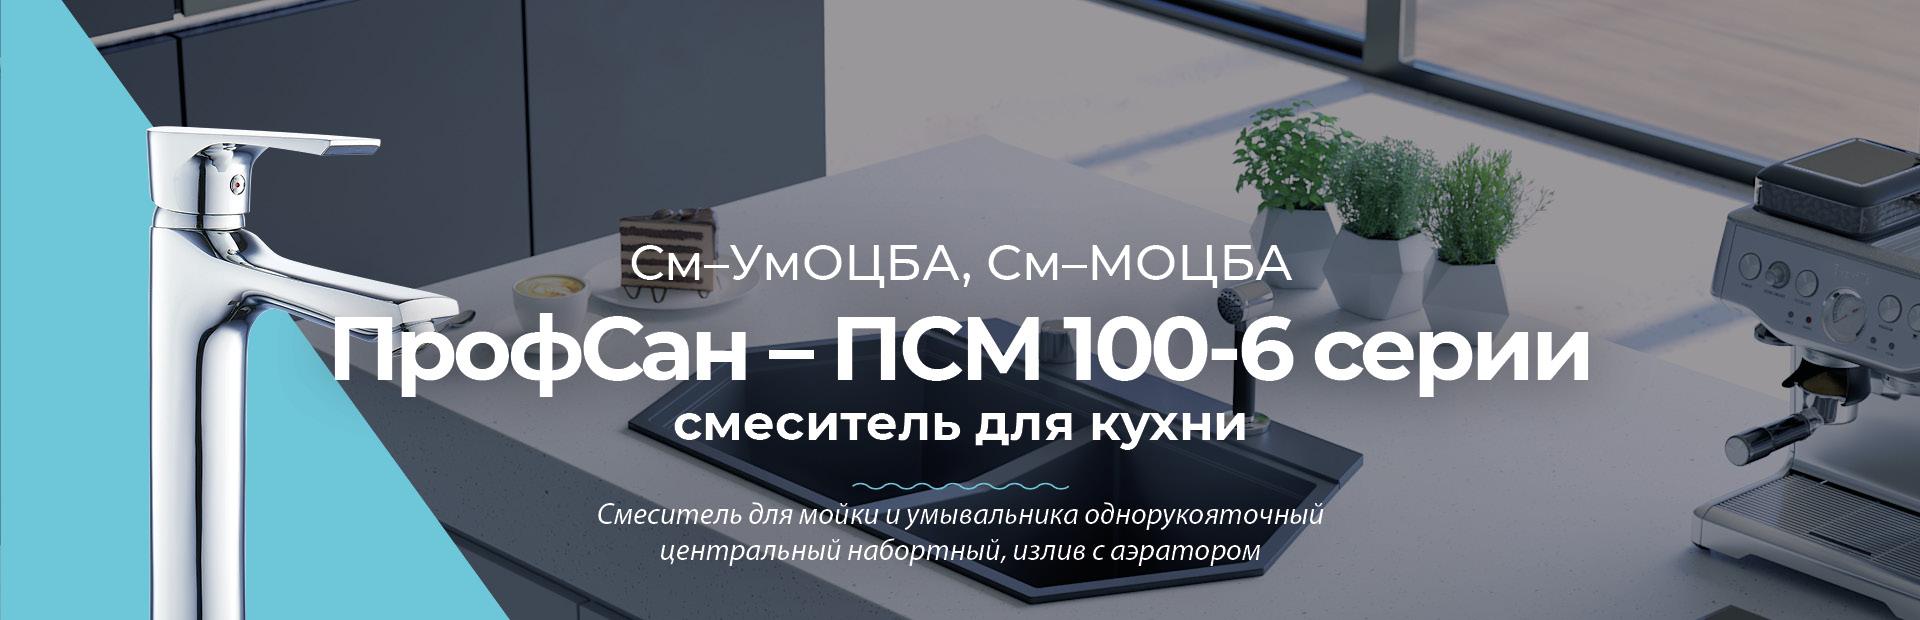 Баннер со смесителем Профсан ПСМ 100-6